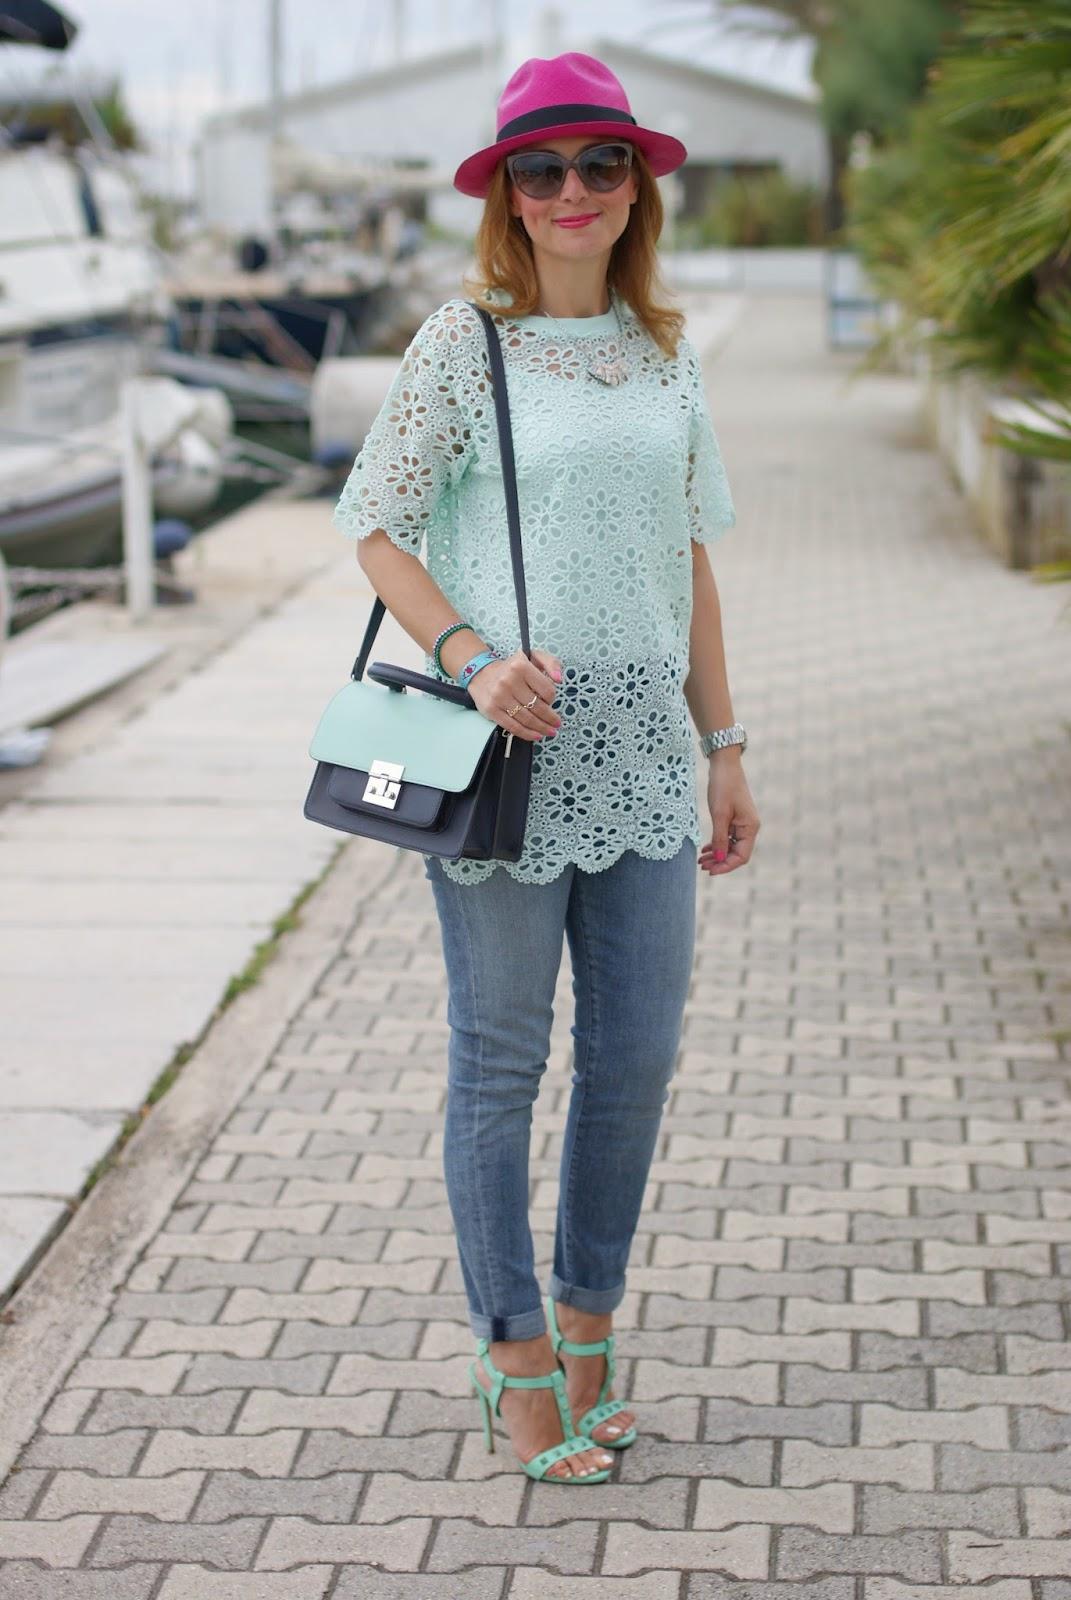 mint green crochet top, Le silla sandals, ecua-andino fuchsia hat, Fashion and Cookies, fashion blogger